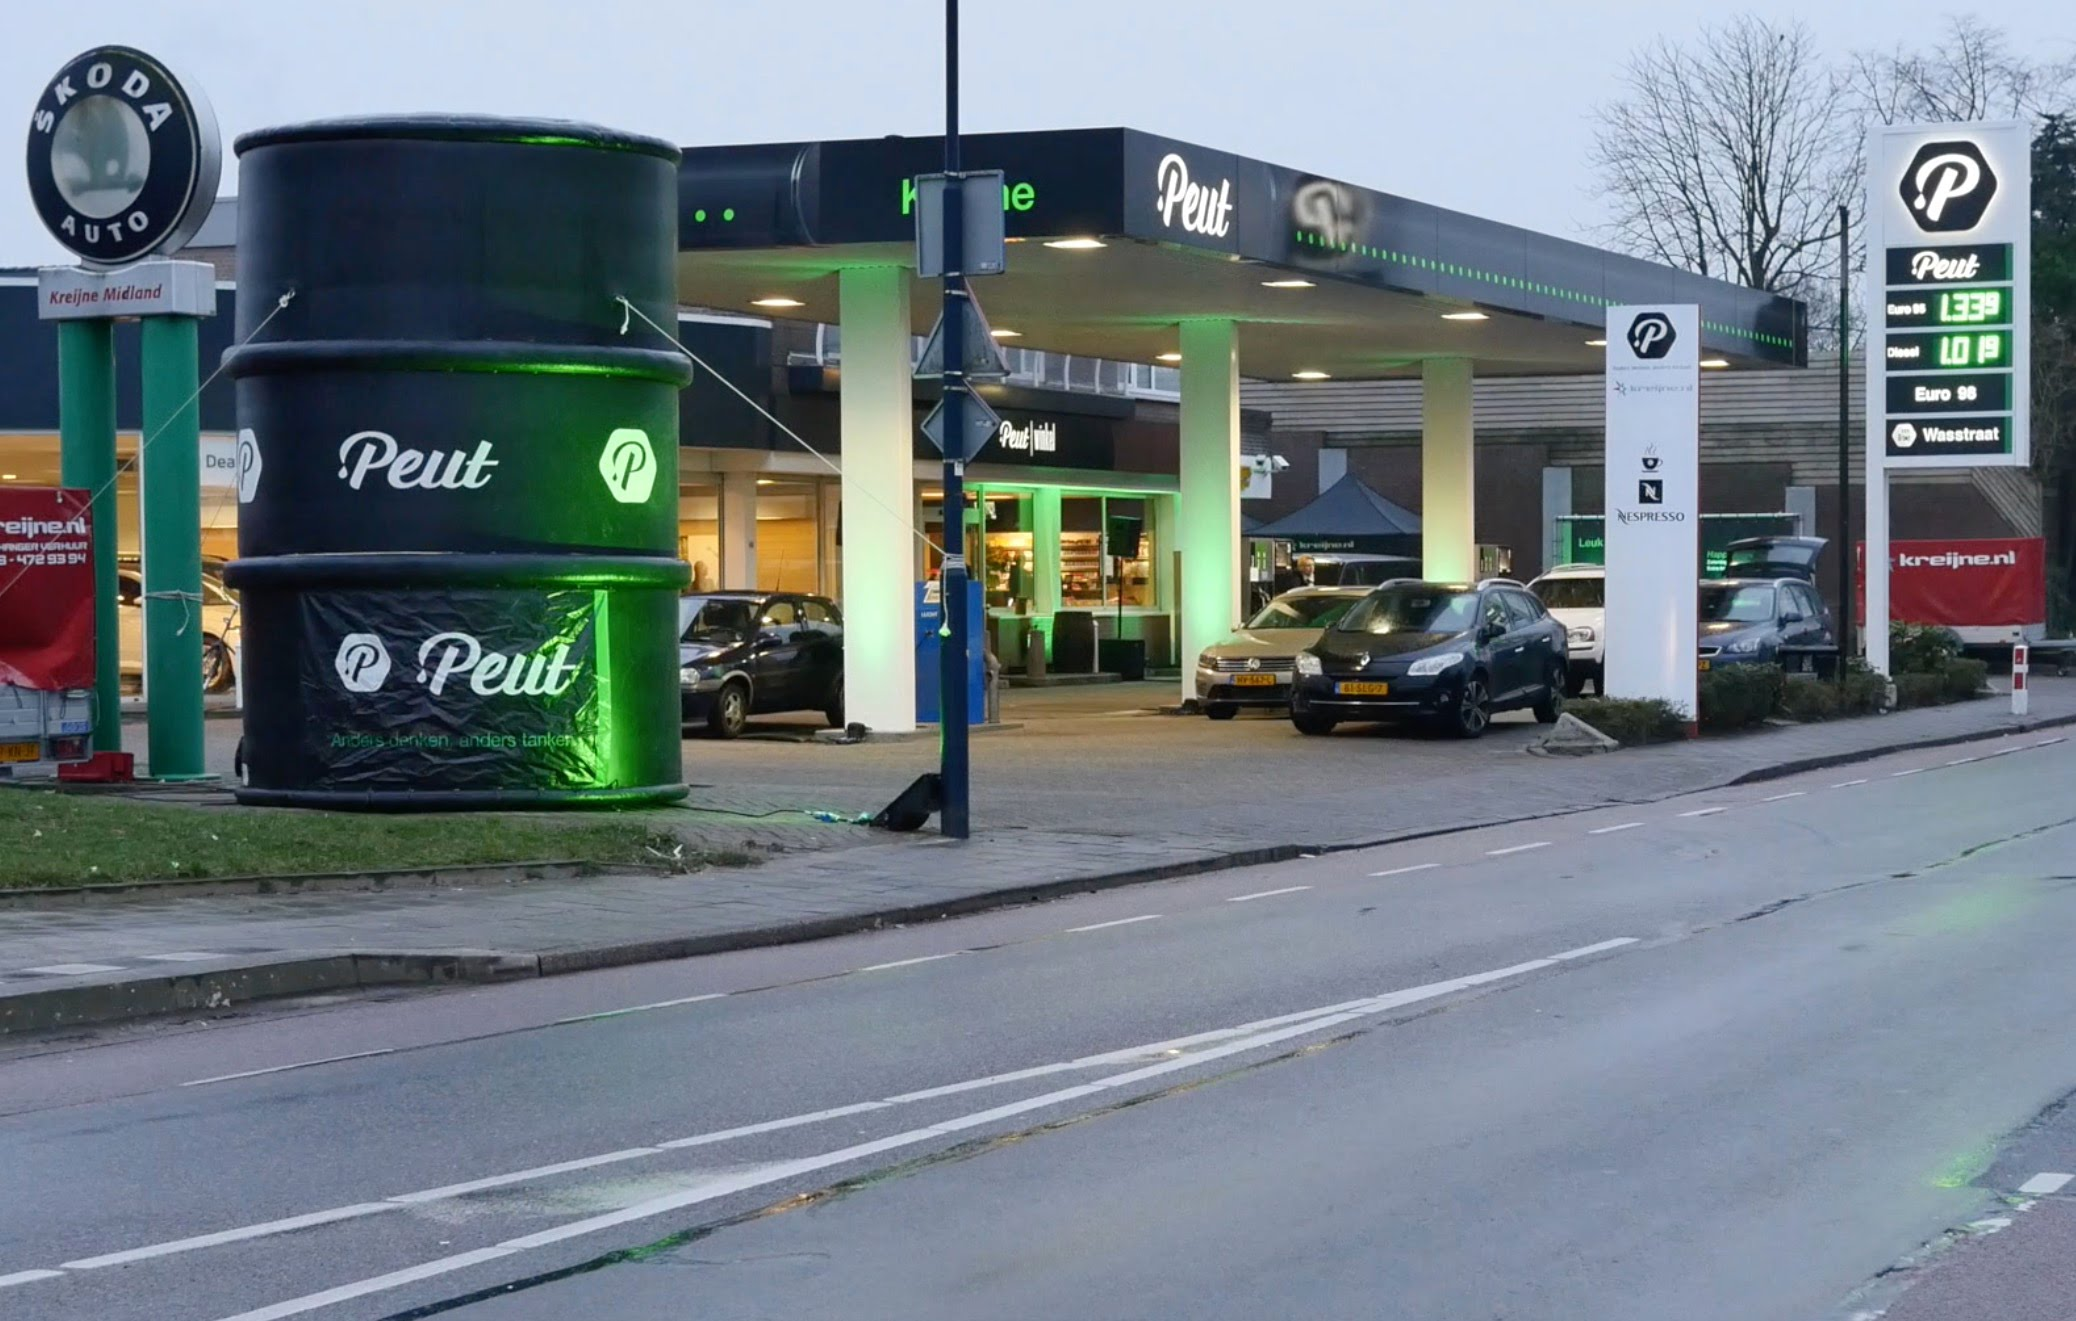 Tankstation Peut in Hoogland